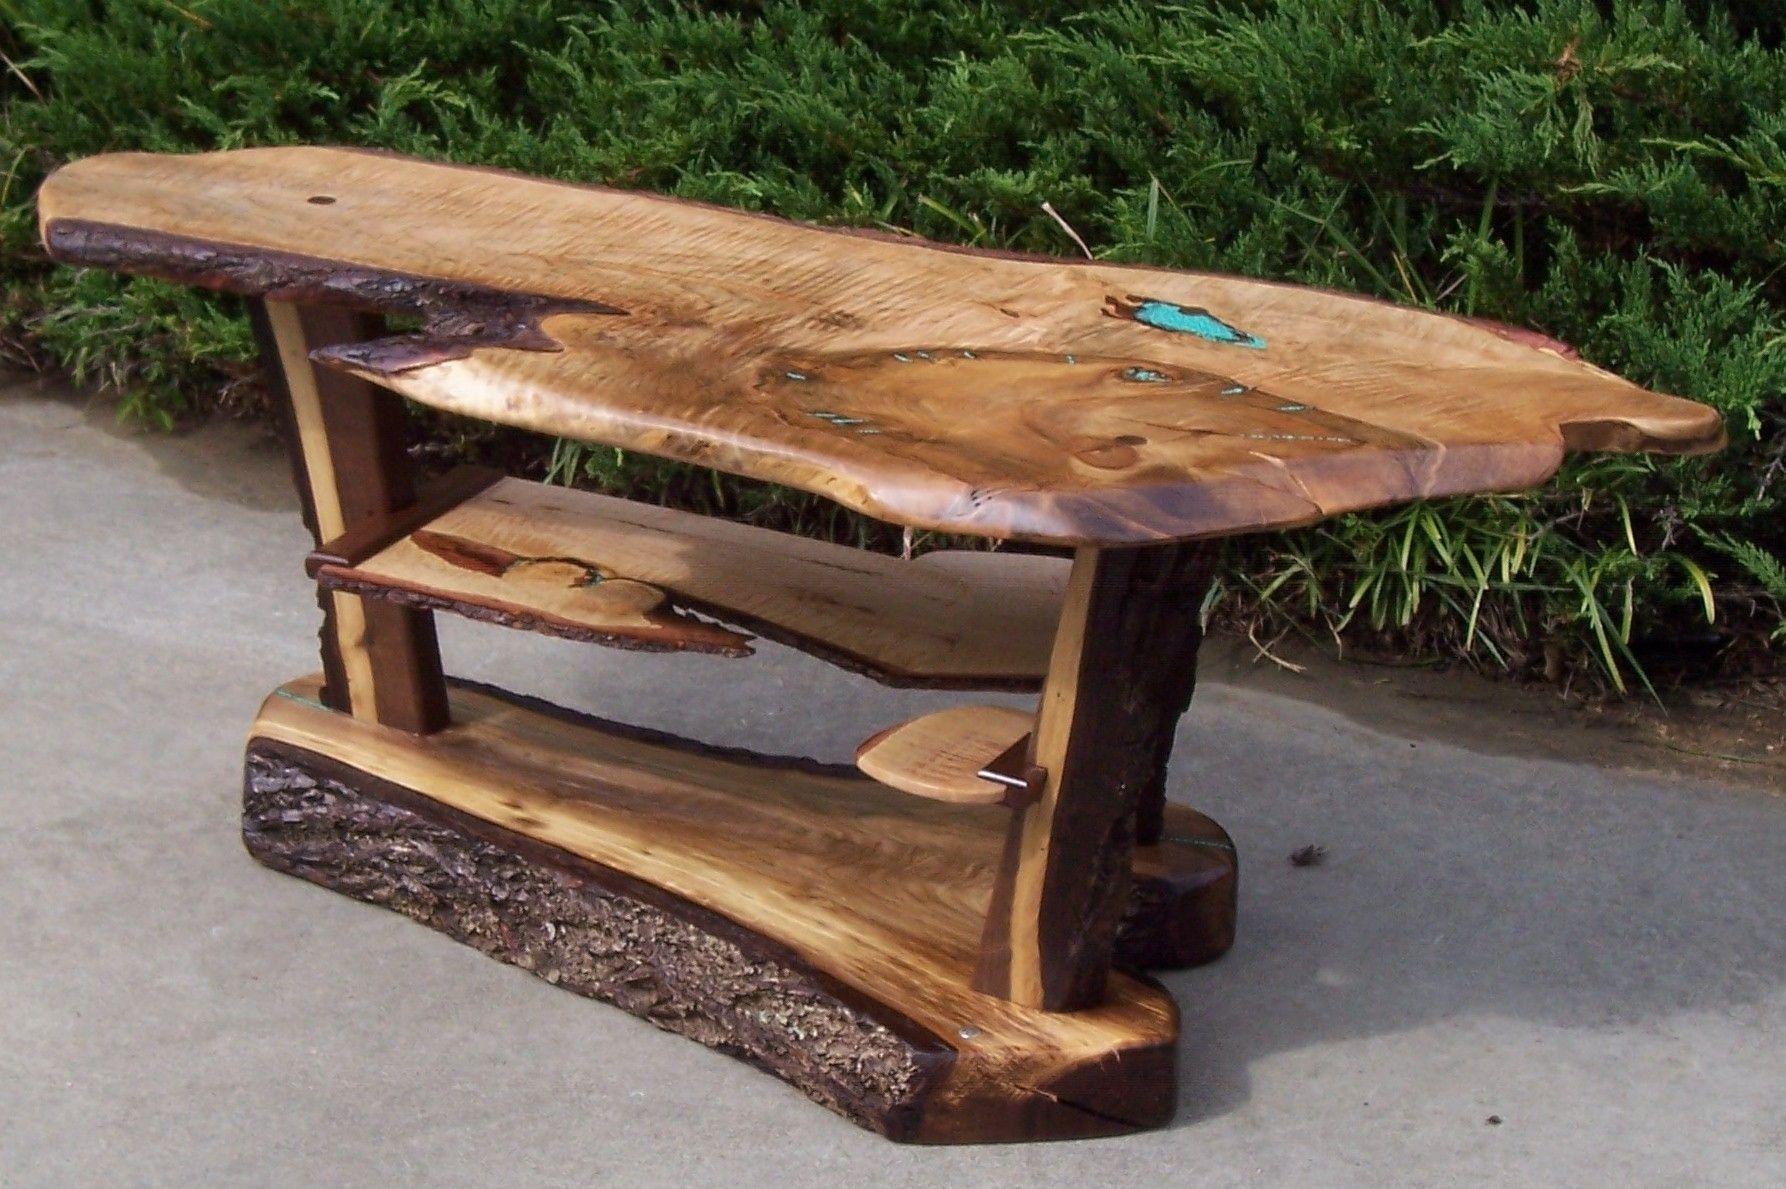 Live Edge Coffee Table Rustic Wood Furniture Wood Table Design Rustic Wood [ 1189 x 1786 Pixel ]